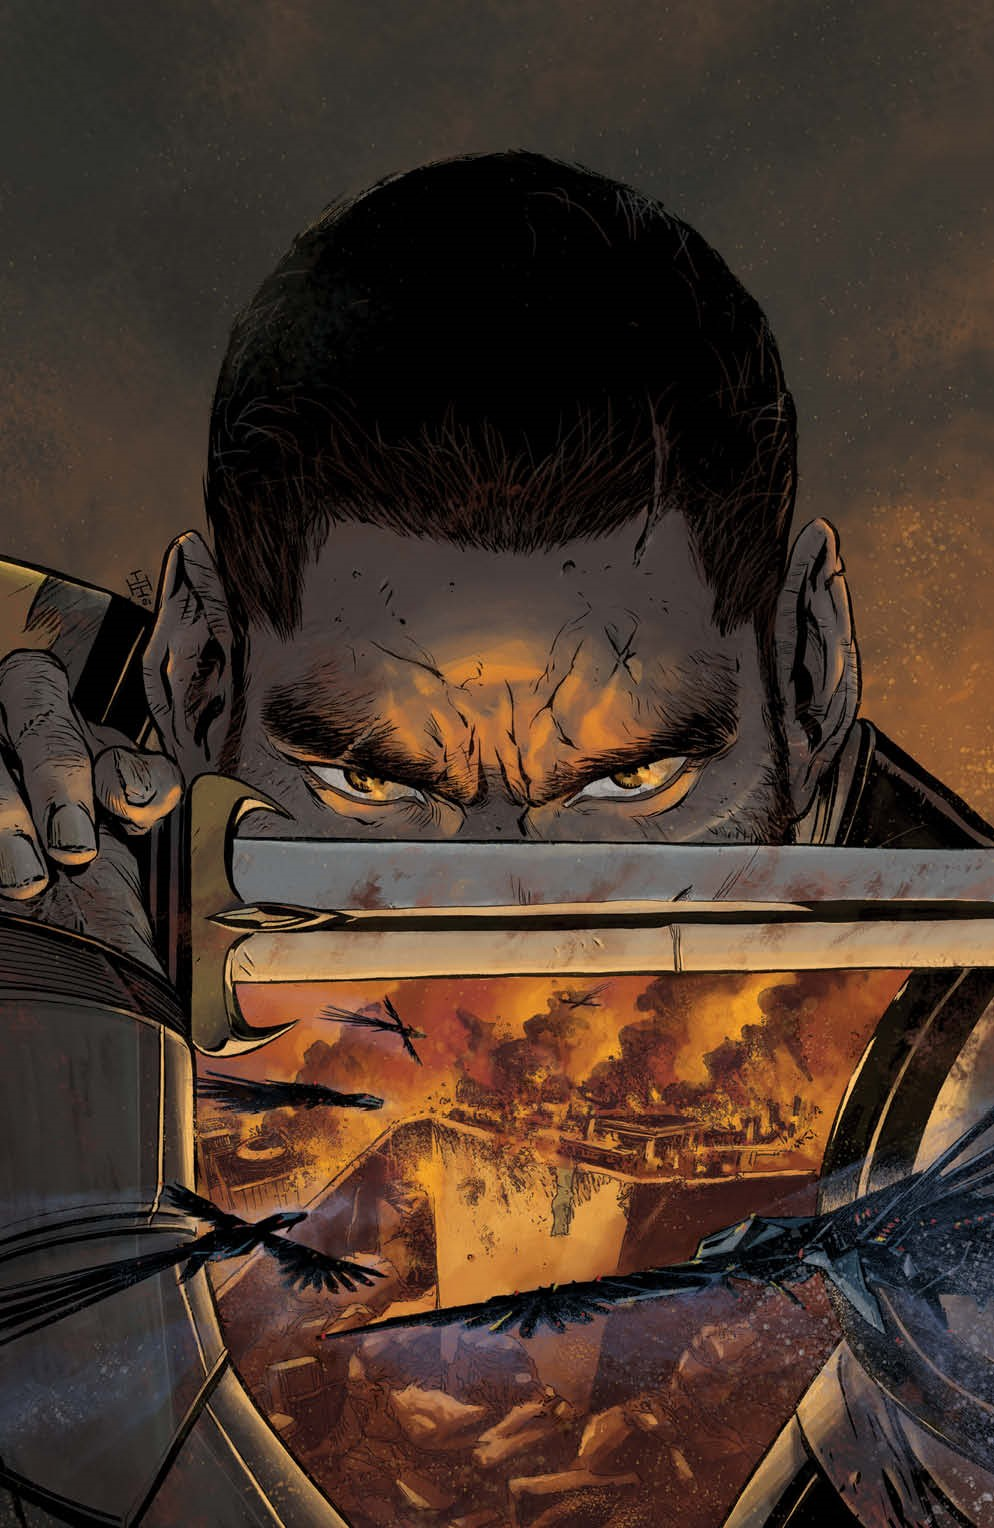 Dune_BloodSardaukar_001_Cover_D_Variant_Undressed ComicList Previews: DUNE BLOOD OF THE SARDAUKAR #1